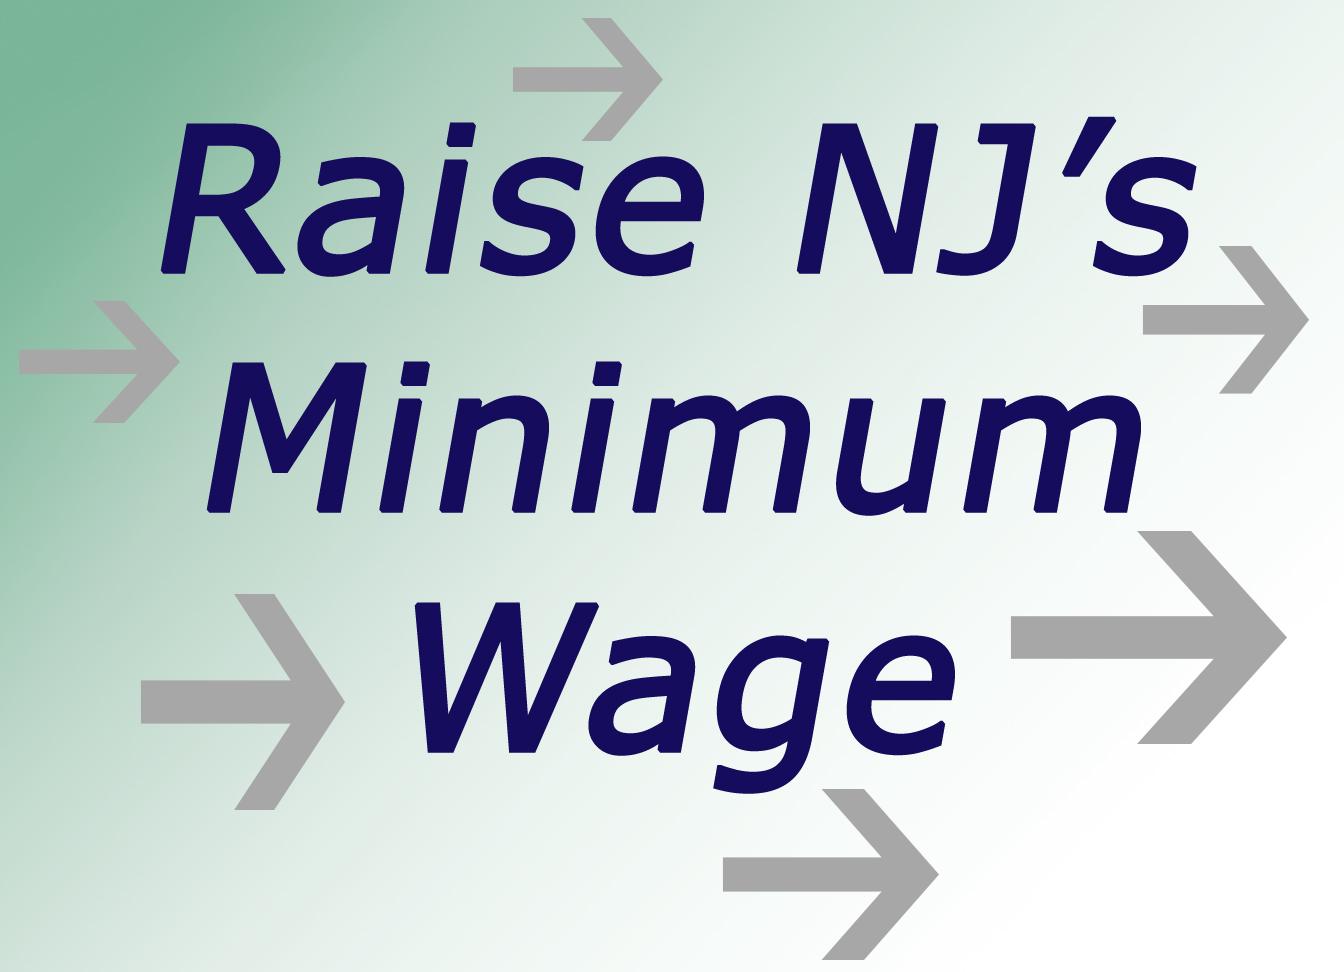 Raise_NJs_Minimum_Wage.jpg